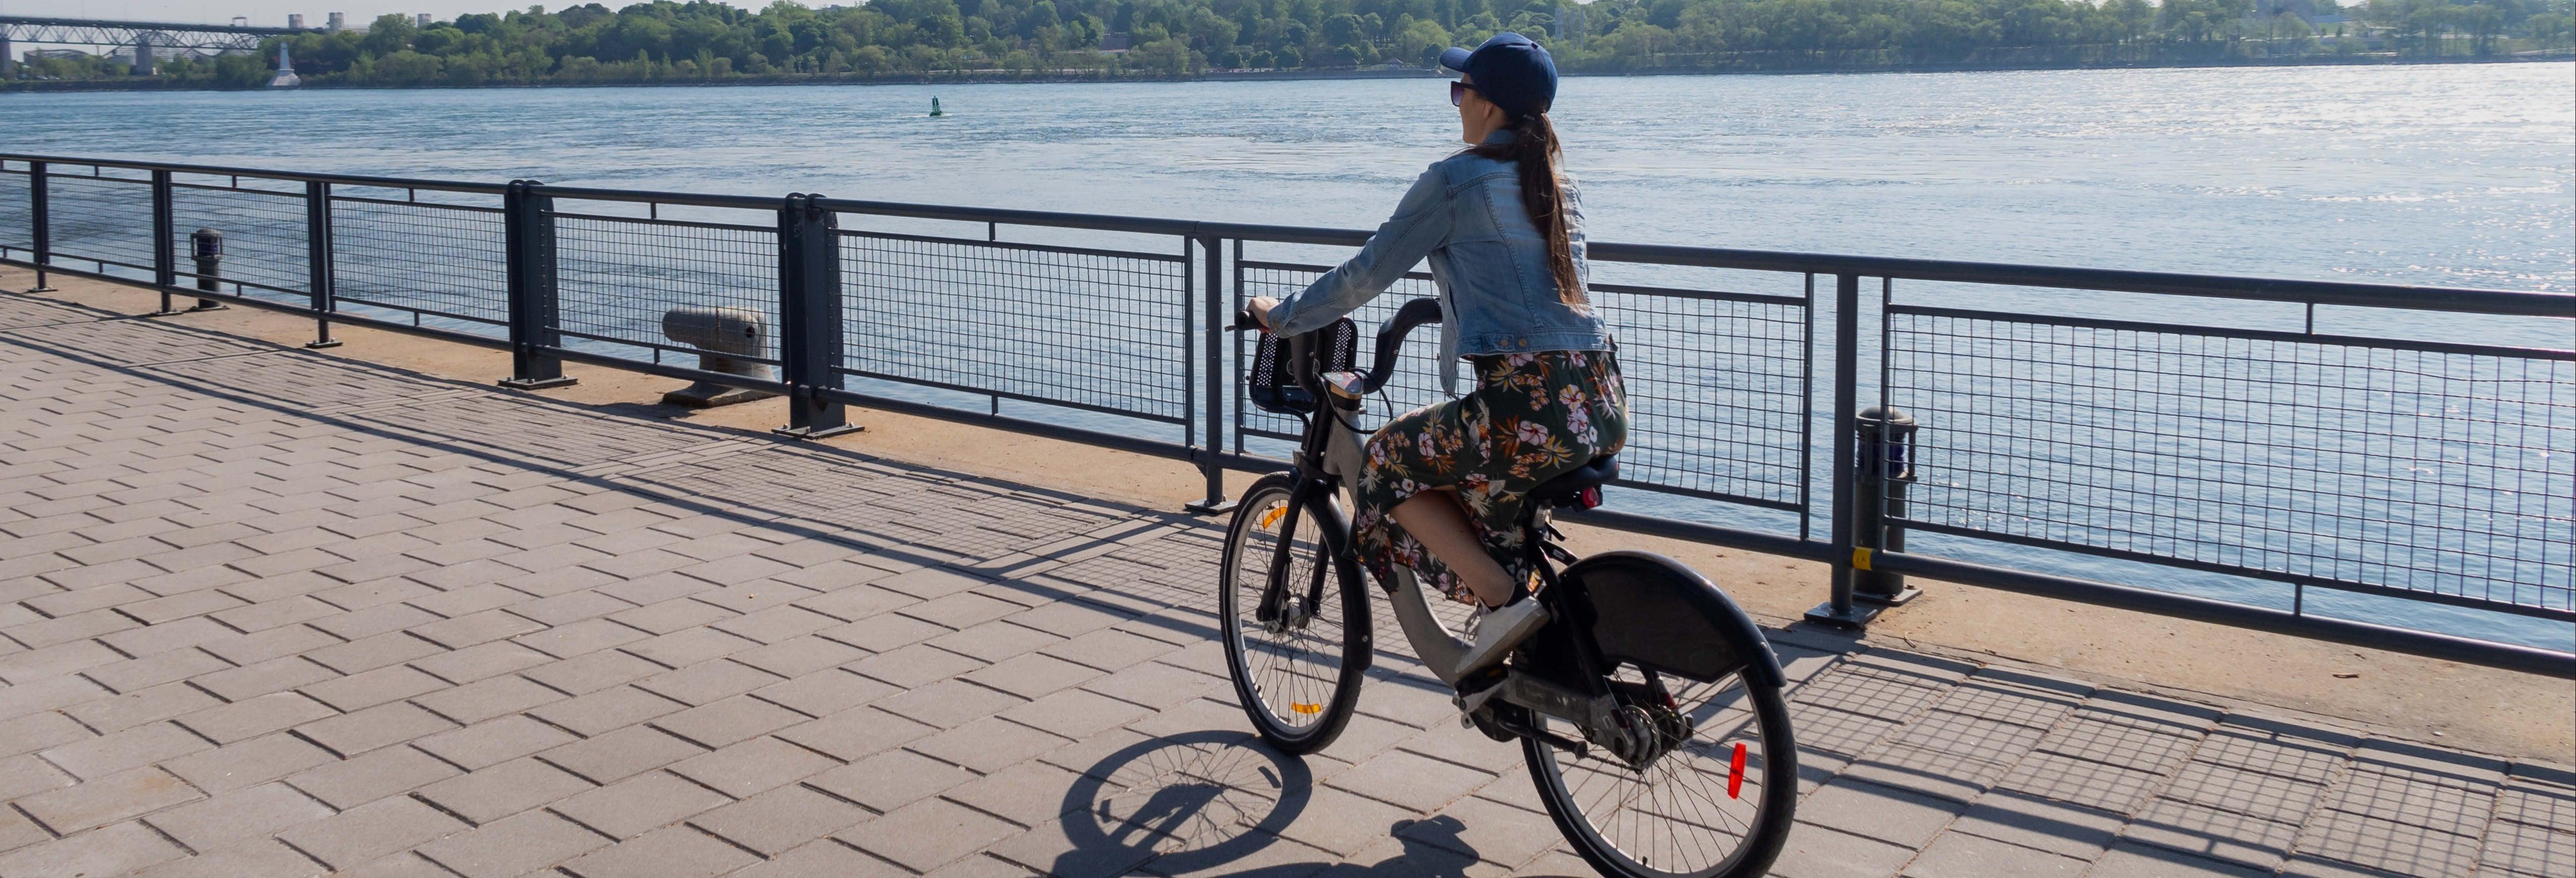 Tour de bicicleta por Montreal